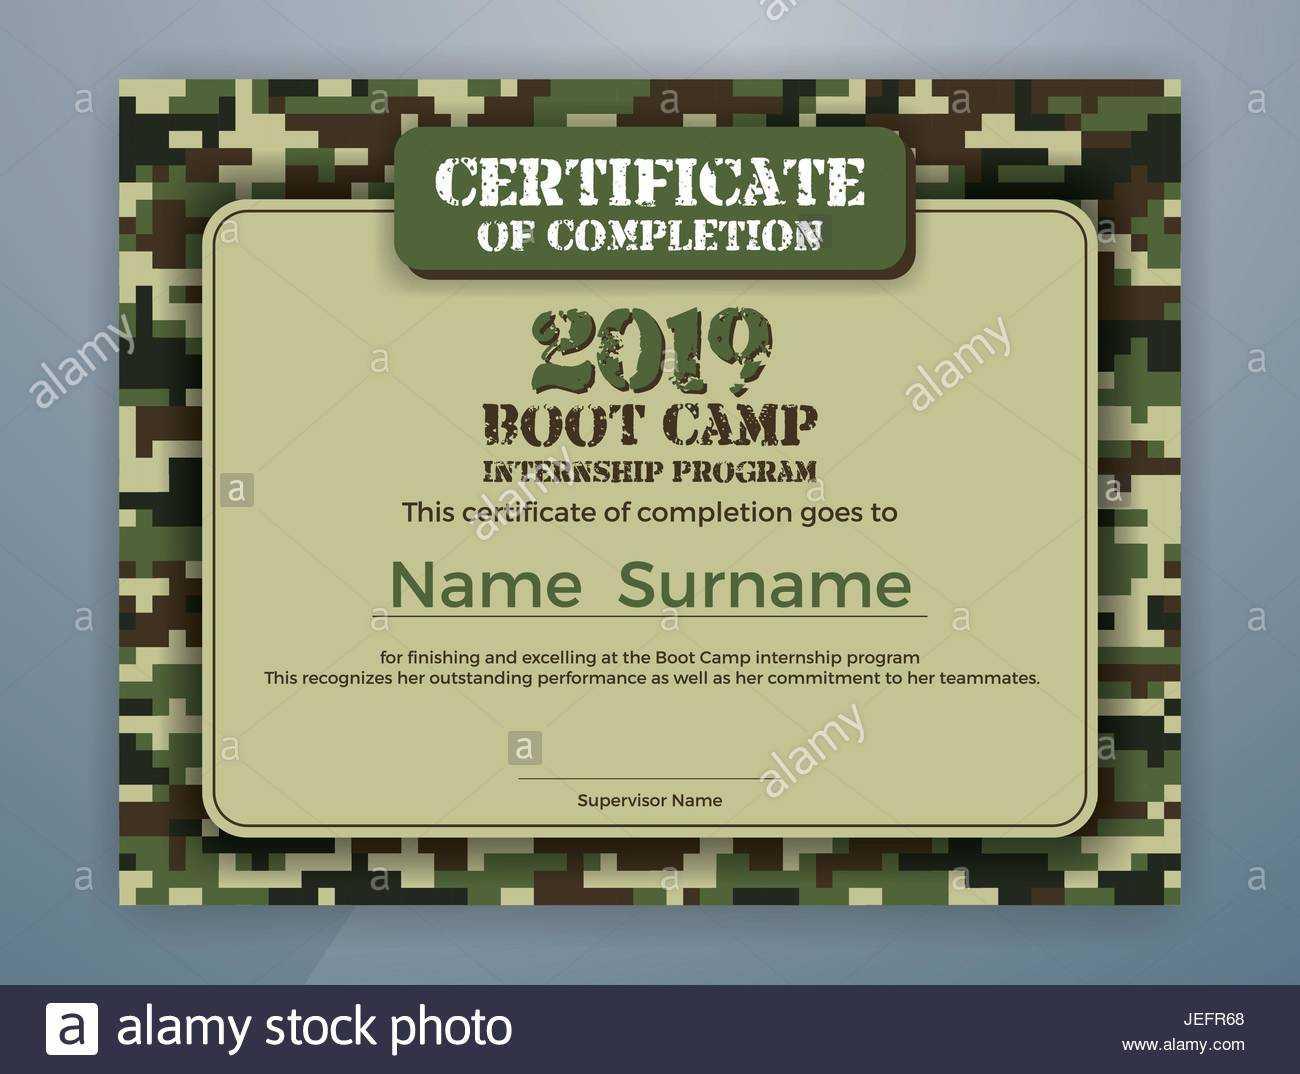 Boot Camp Internship Program Certificate Template Design Throughout Boot Camp Certificate Template